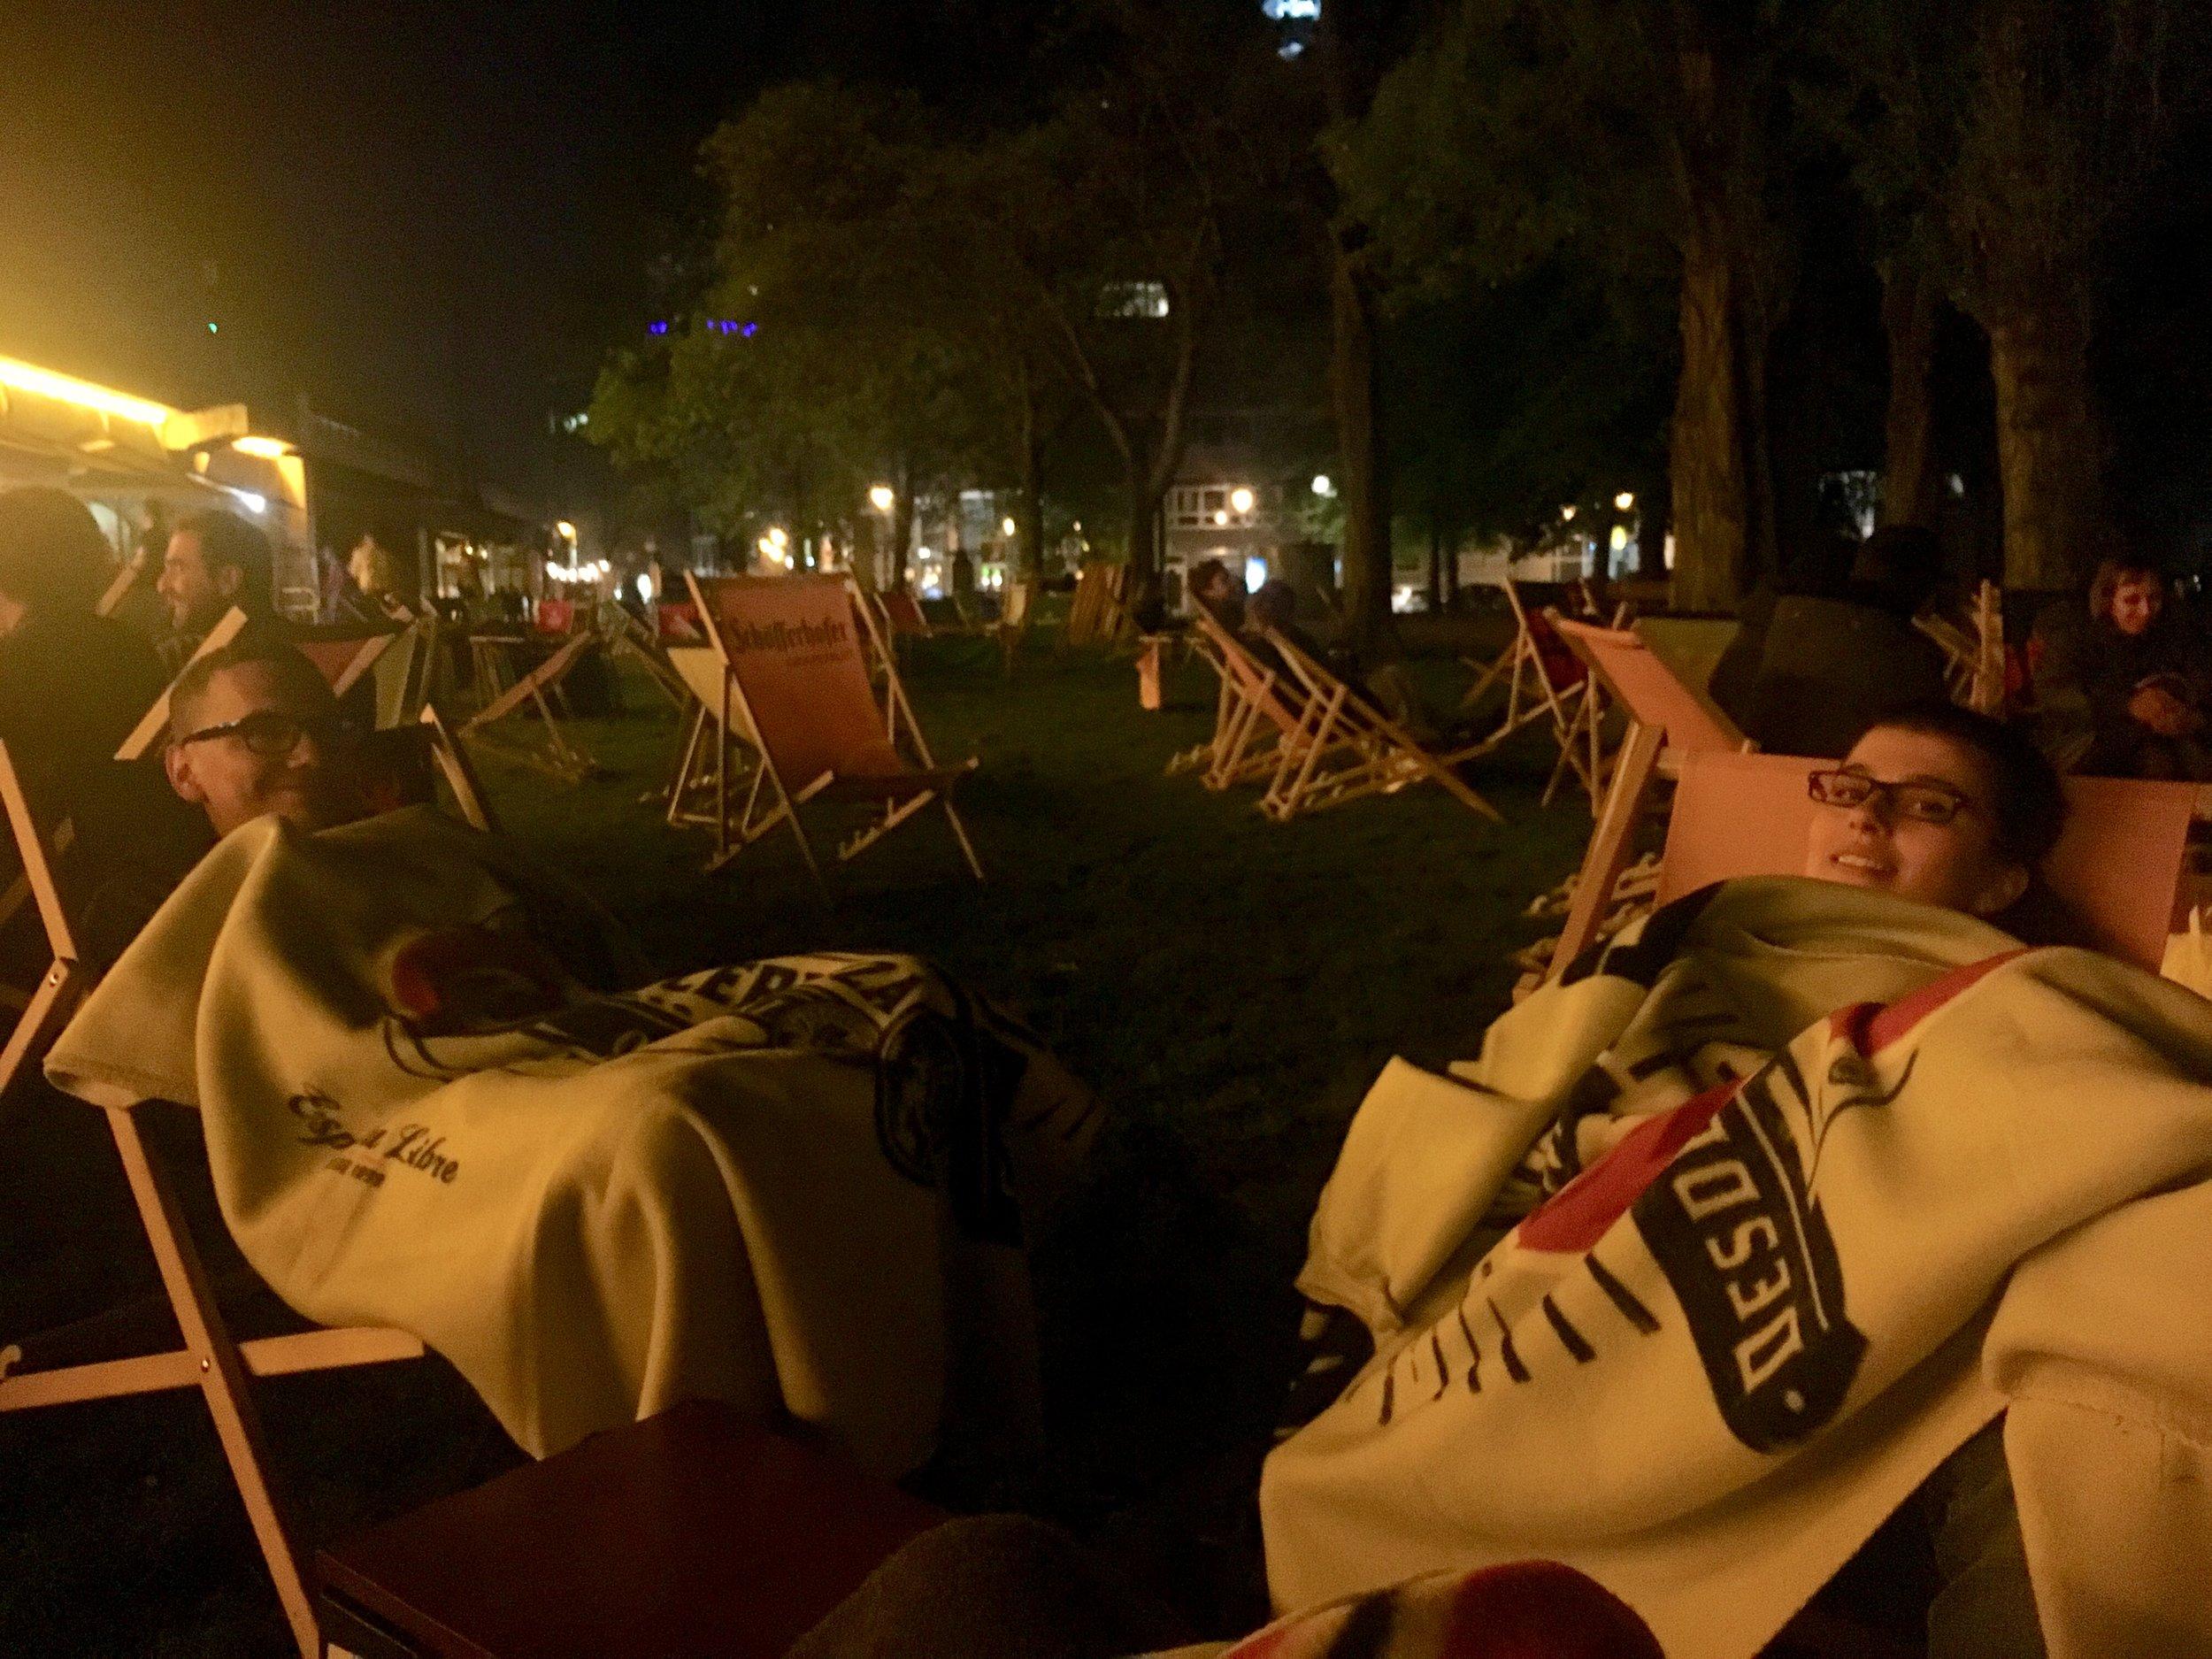 Berlin_Monbijou-Park-night